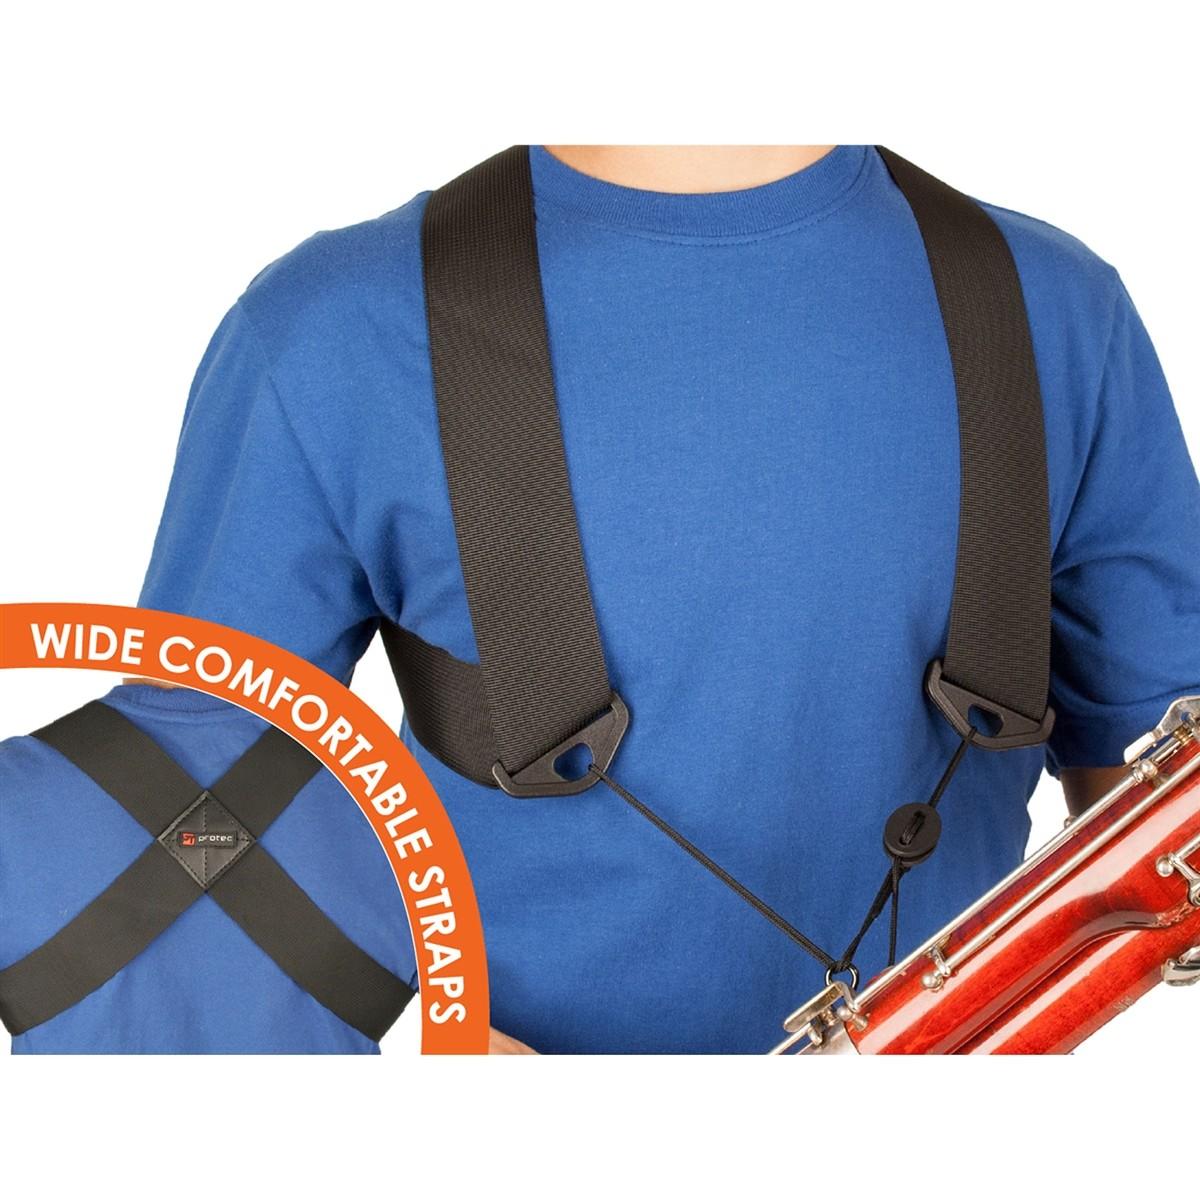 Protec Bassoon Nylon Harness (A301)